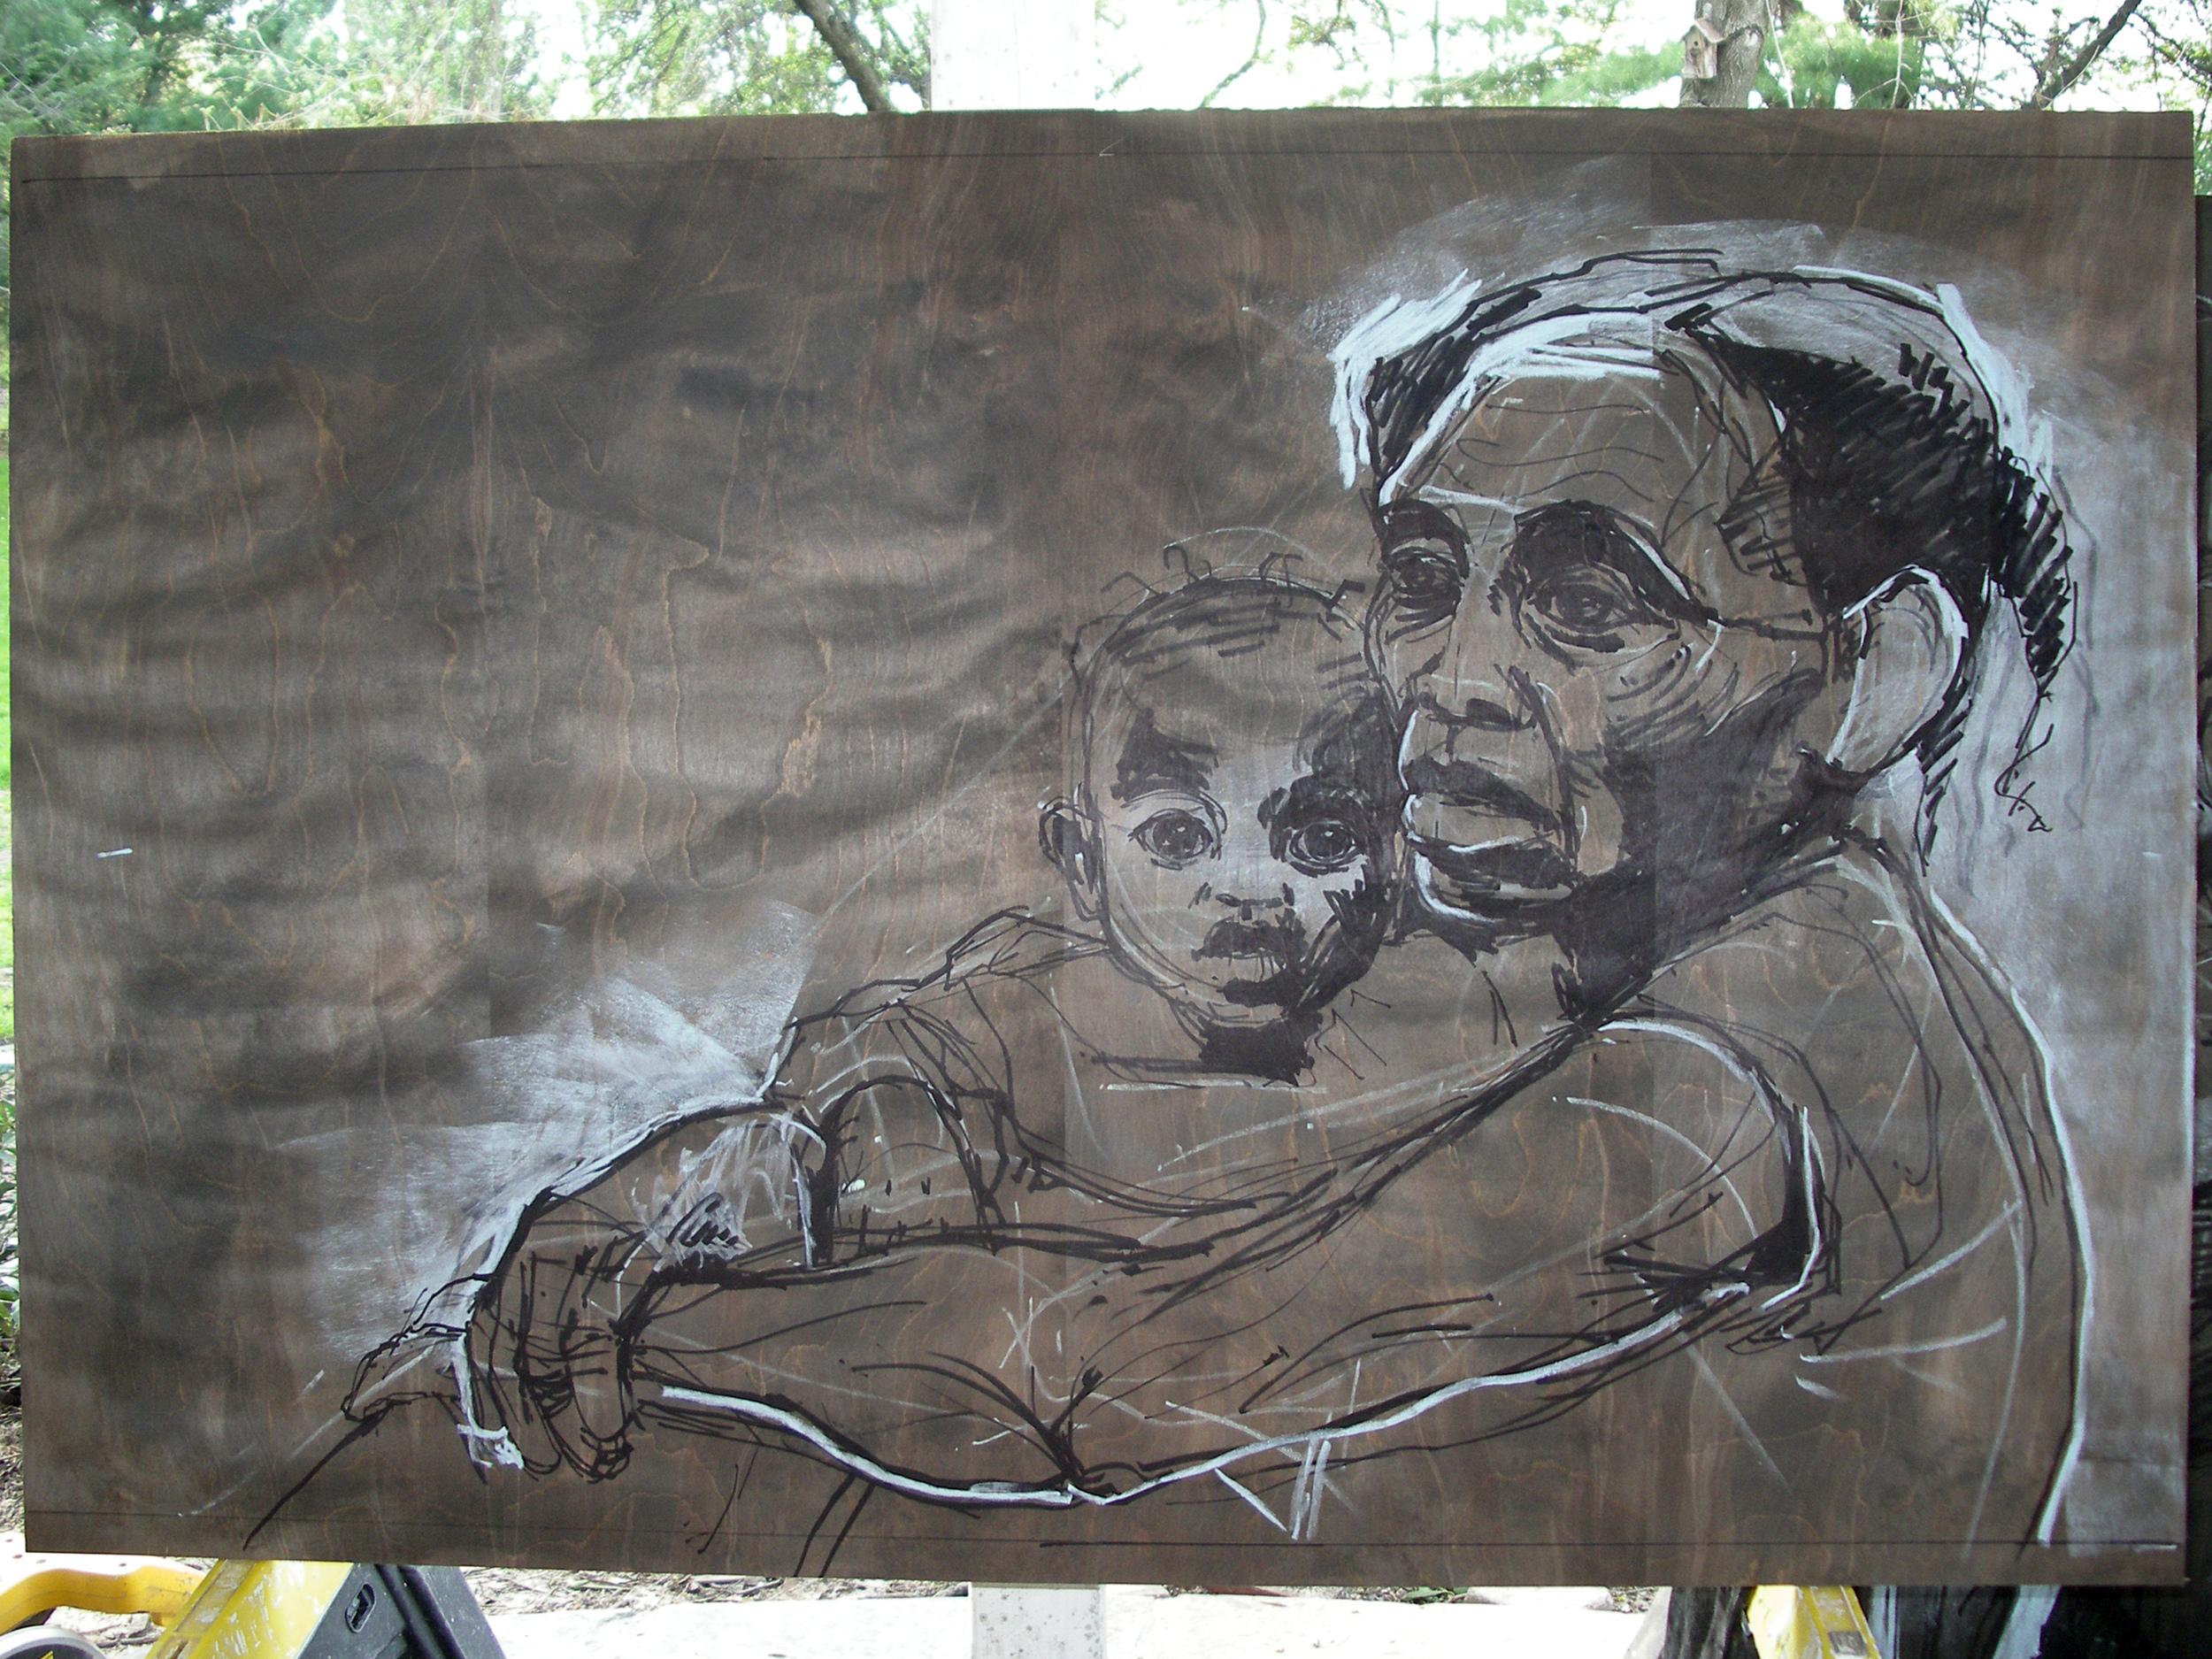 Roseline & Wadeline: Developing drawing